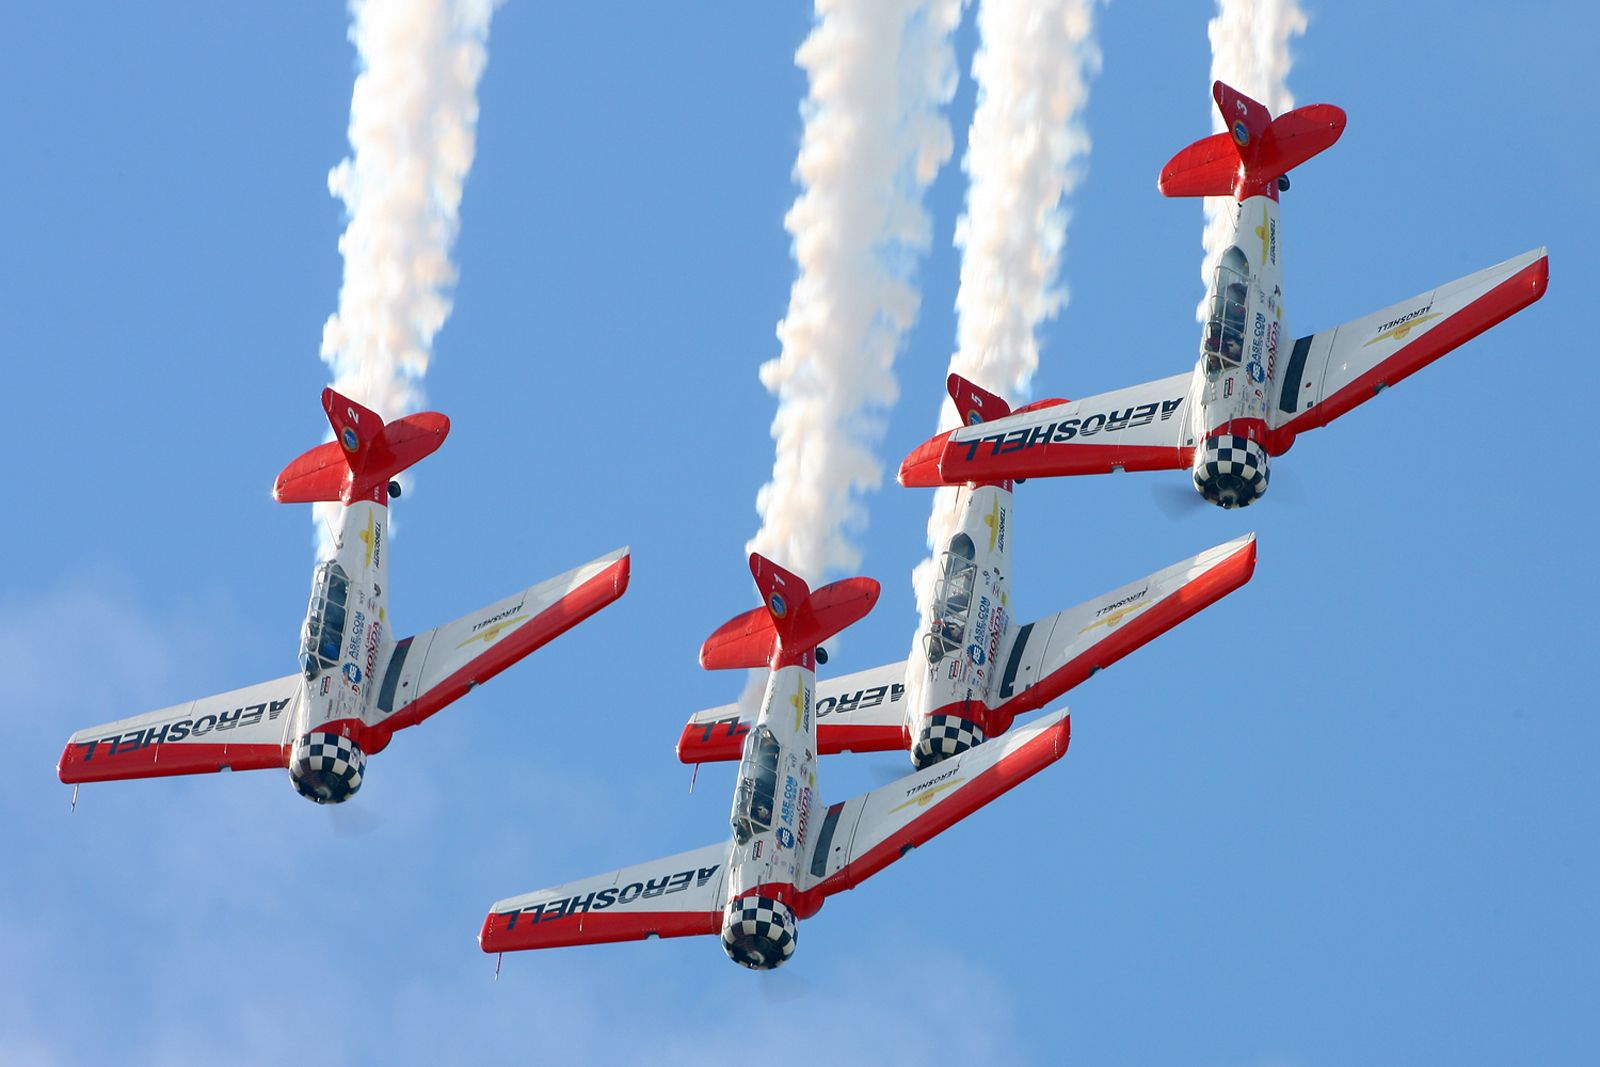 Aeroshell T6 Aerobatic team Air show, Tuskegee airmen